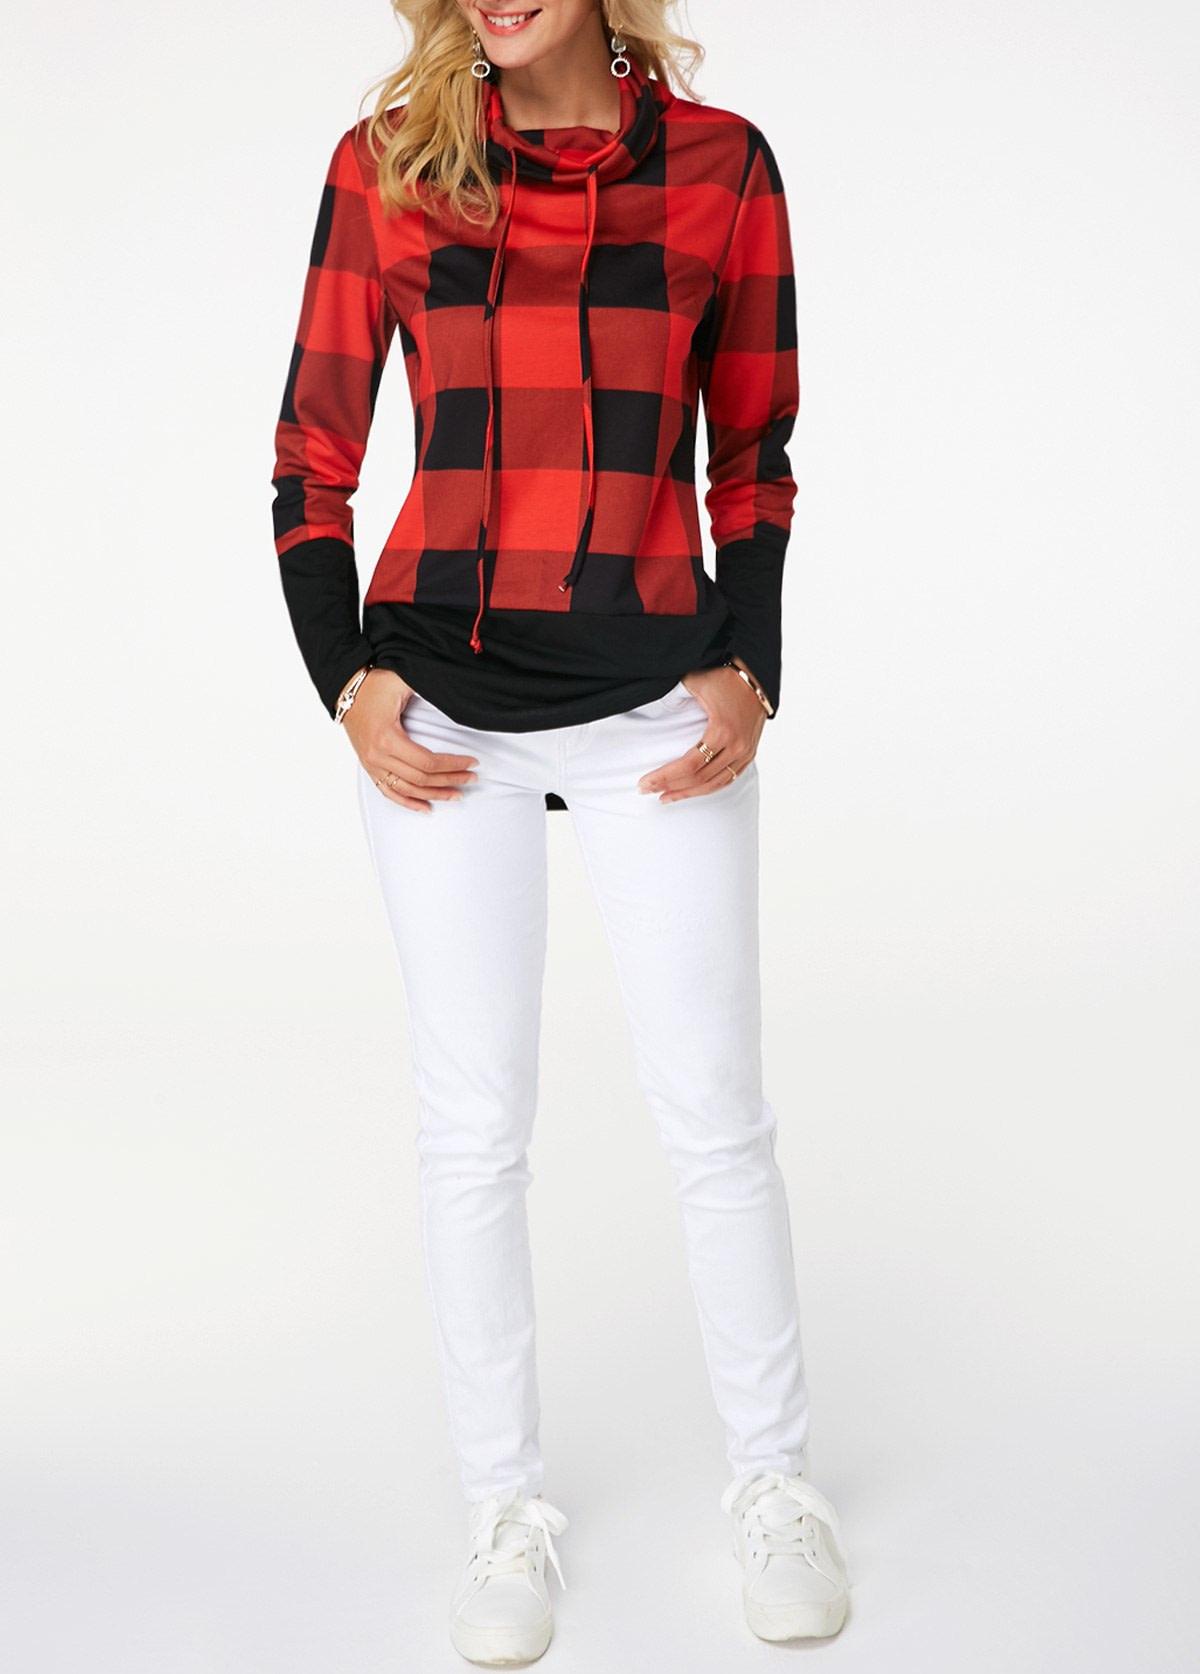 Women's Plaid Print Turtleneck Hoodie, Casual Long Sleeve Women's Plus Size Sweatshirt 8